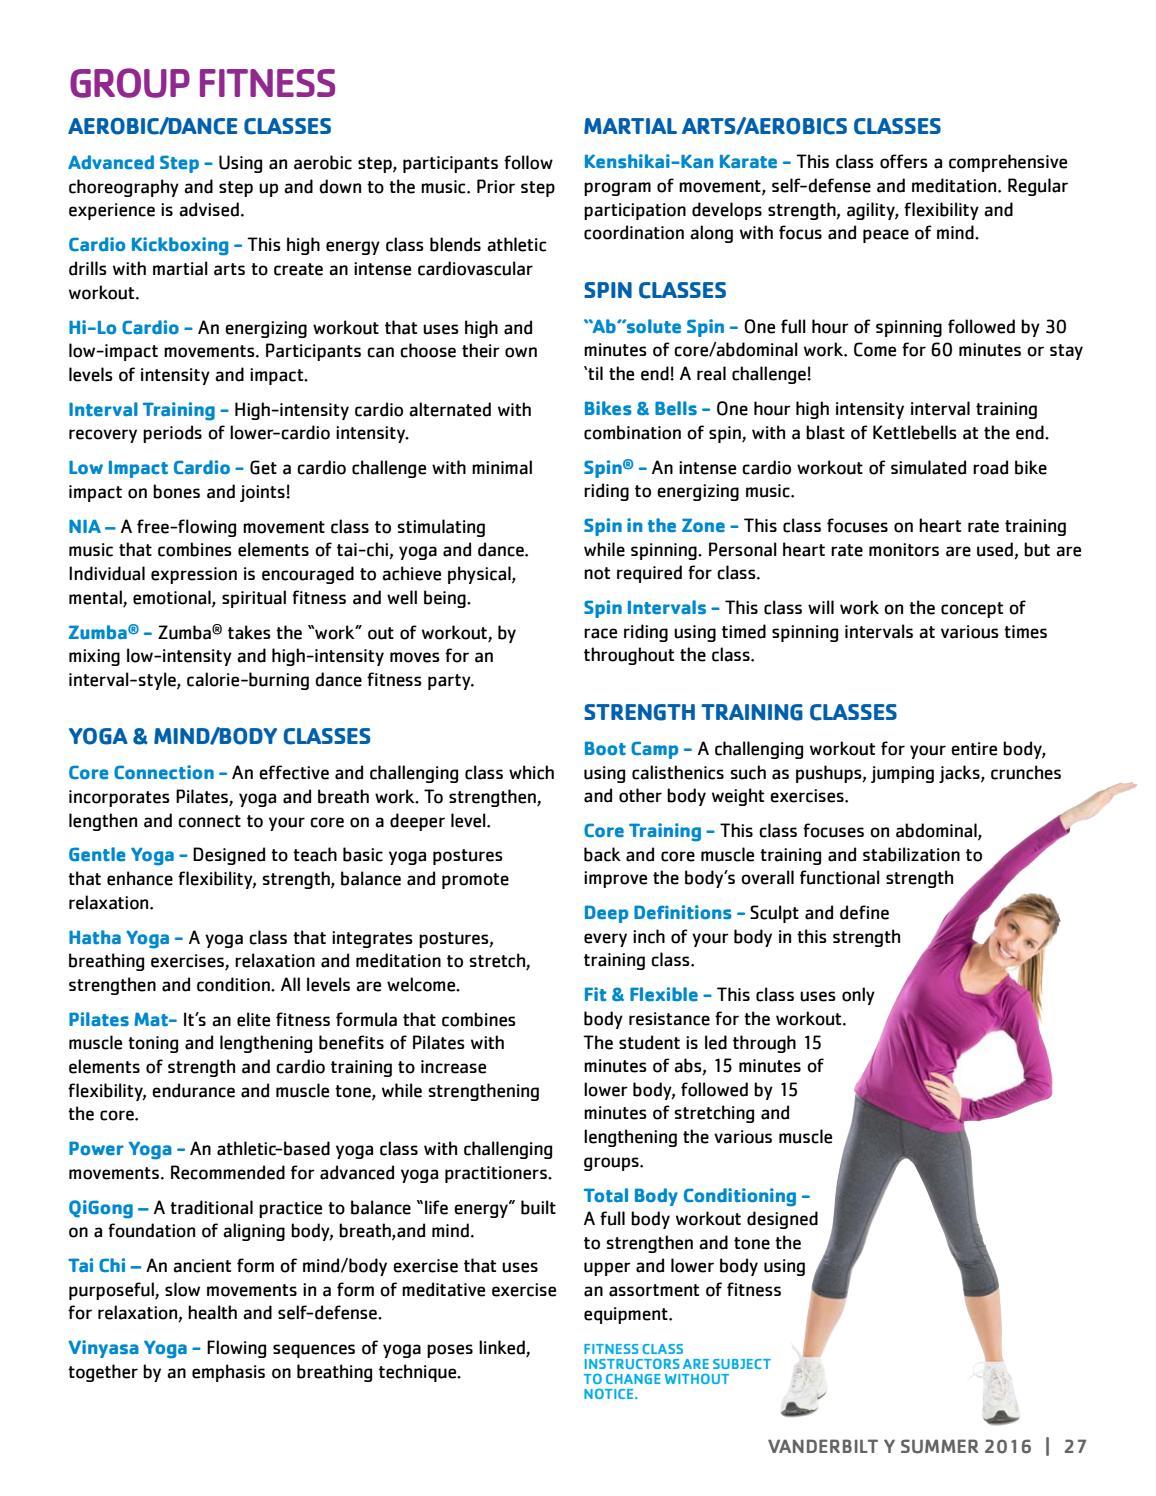 2016 Vanderbilt Summer Program Guide 7/1 by New York City's YMCA - issuu